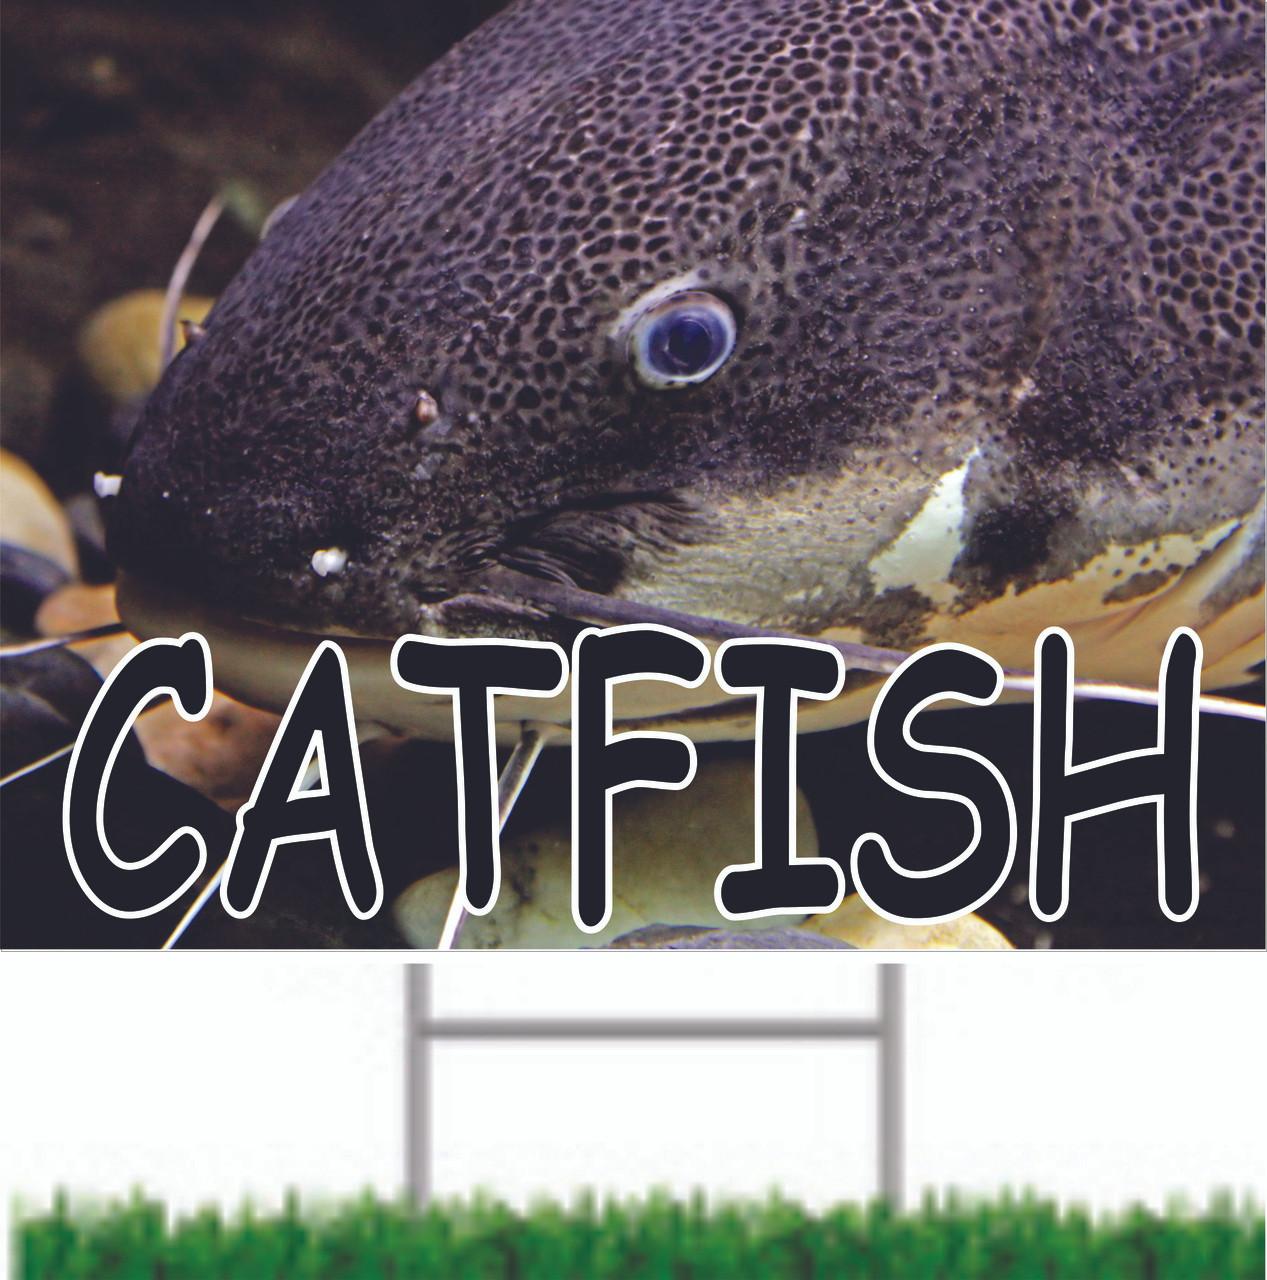 Catfish Road Sign.